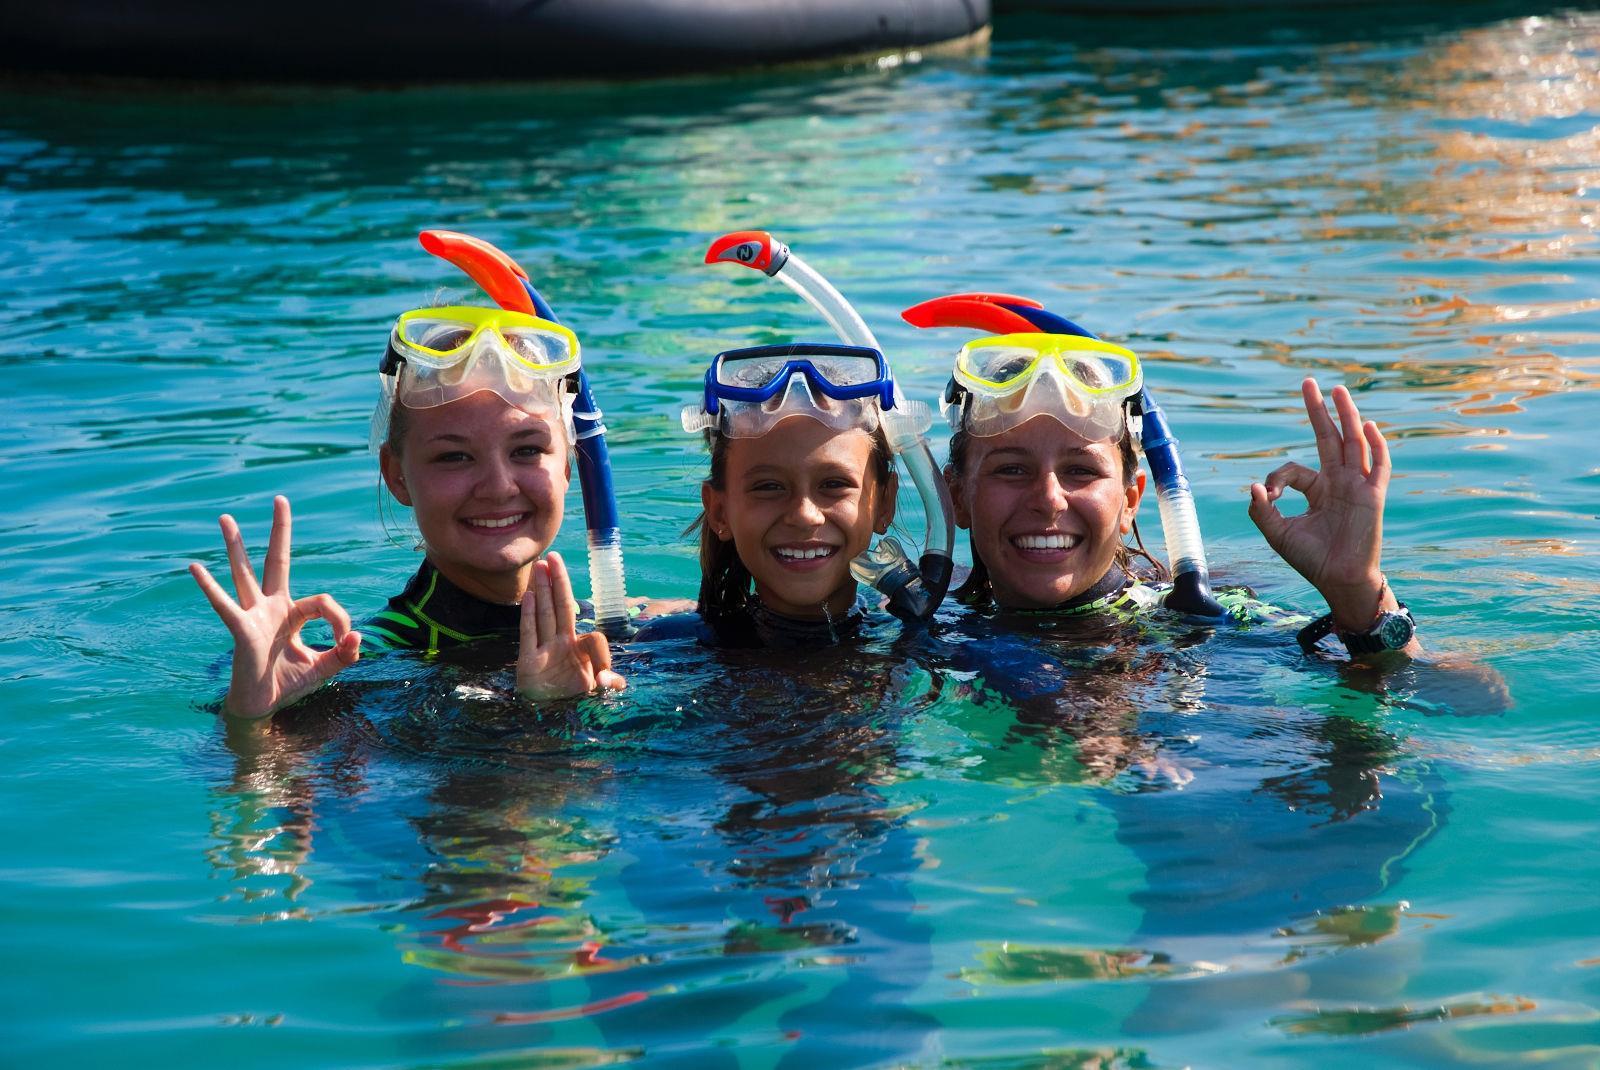 Snorkelling-in-Caleta-de-Fuste-3